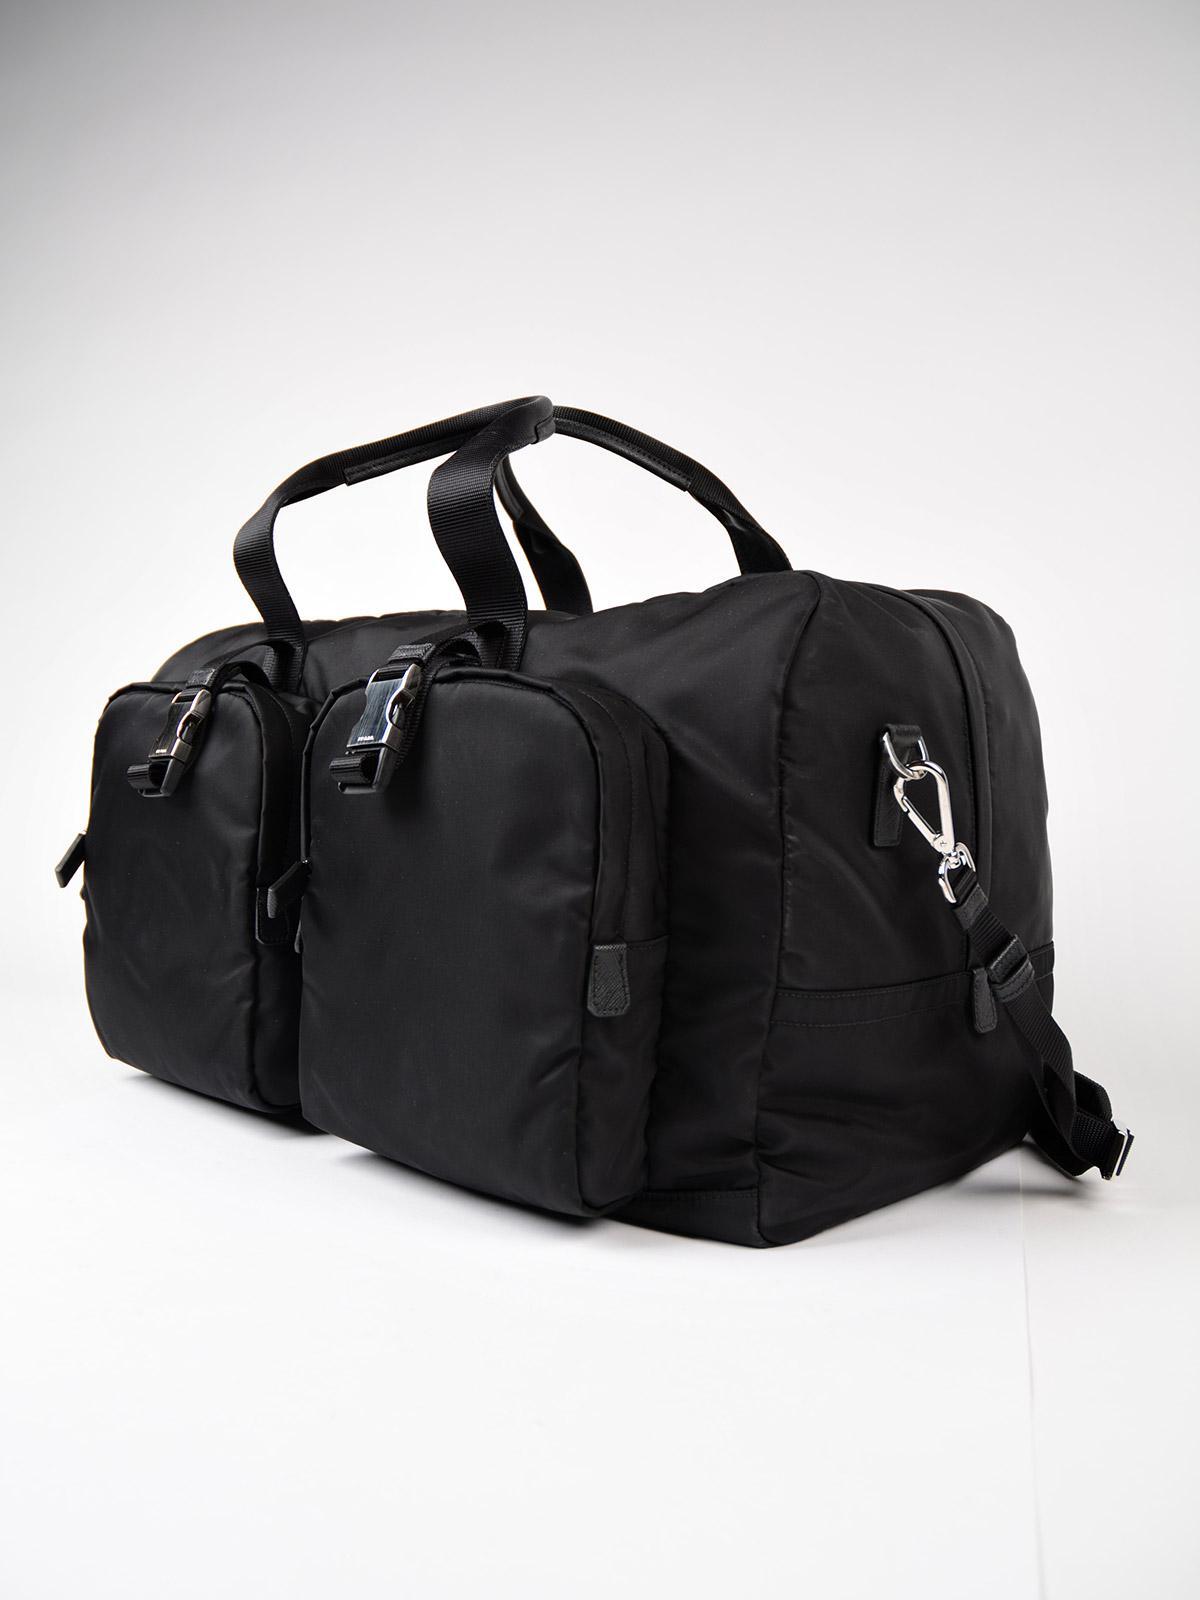 590e805eb691 Prada Tessuto Montagna Travel Bag in Black for Men - Lyst